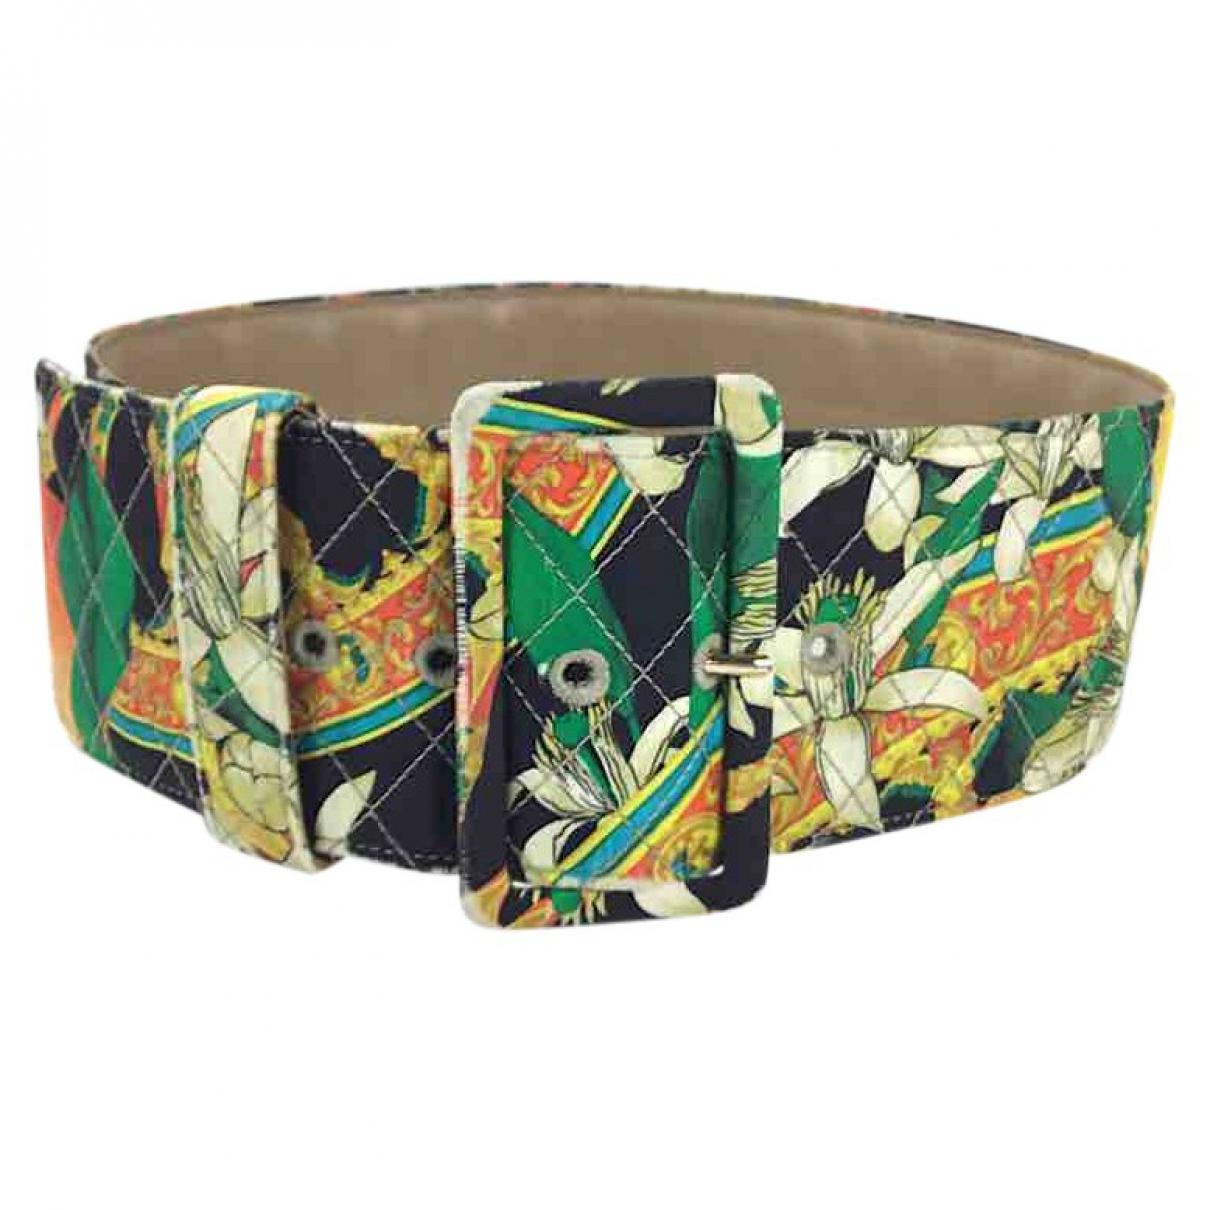 Dolce & Gabbana \N Multicolour Cloth belt for Women 70 cm